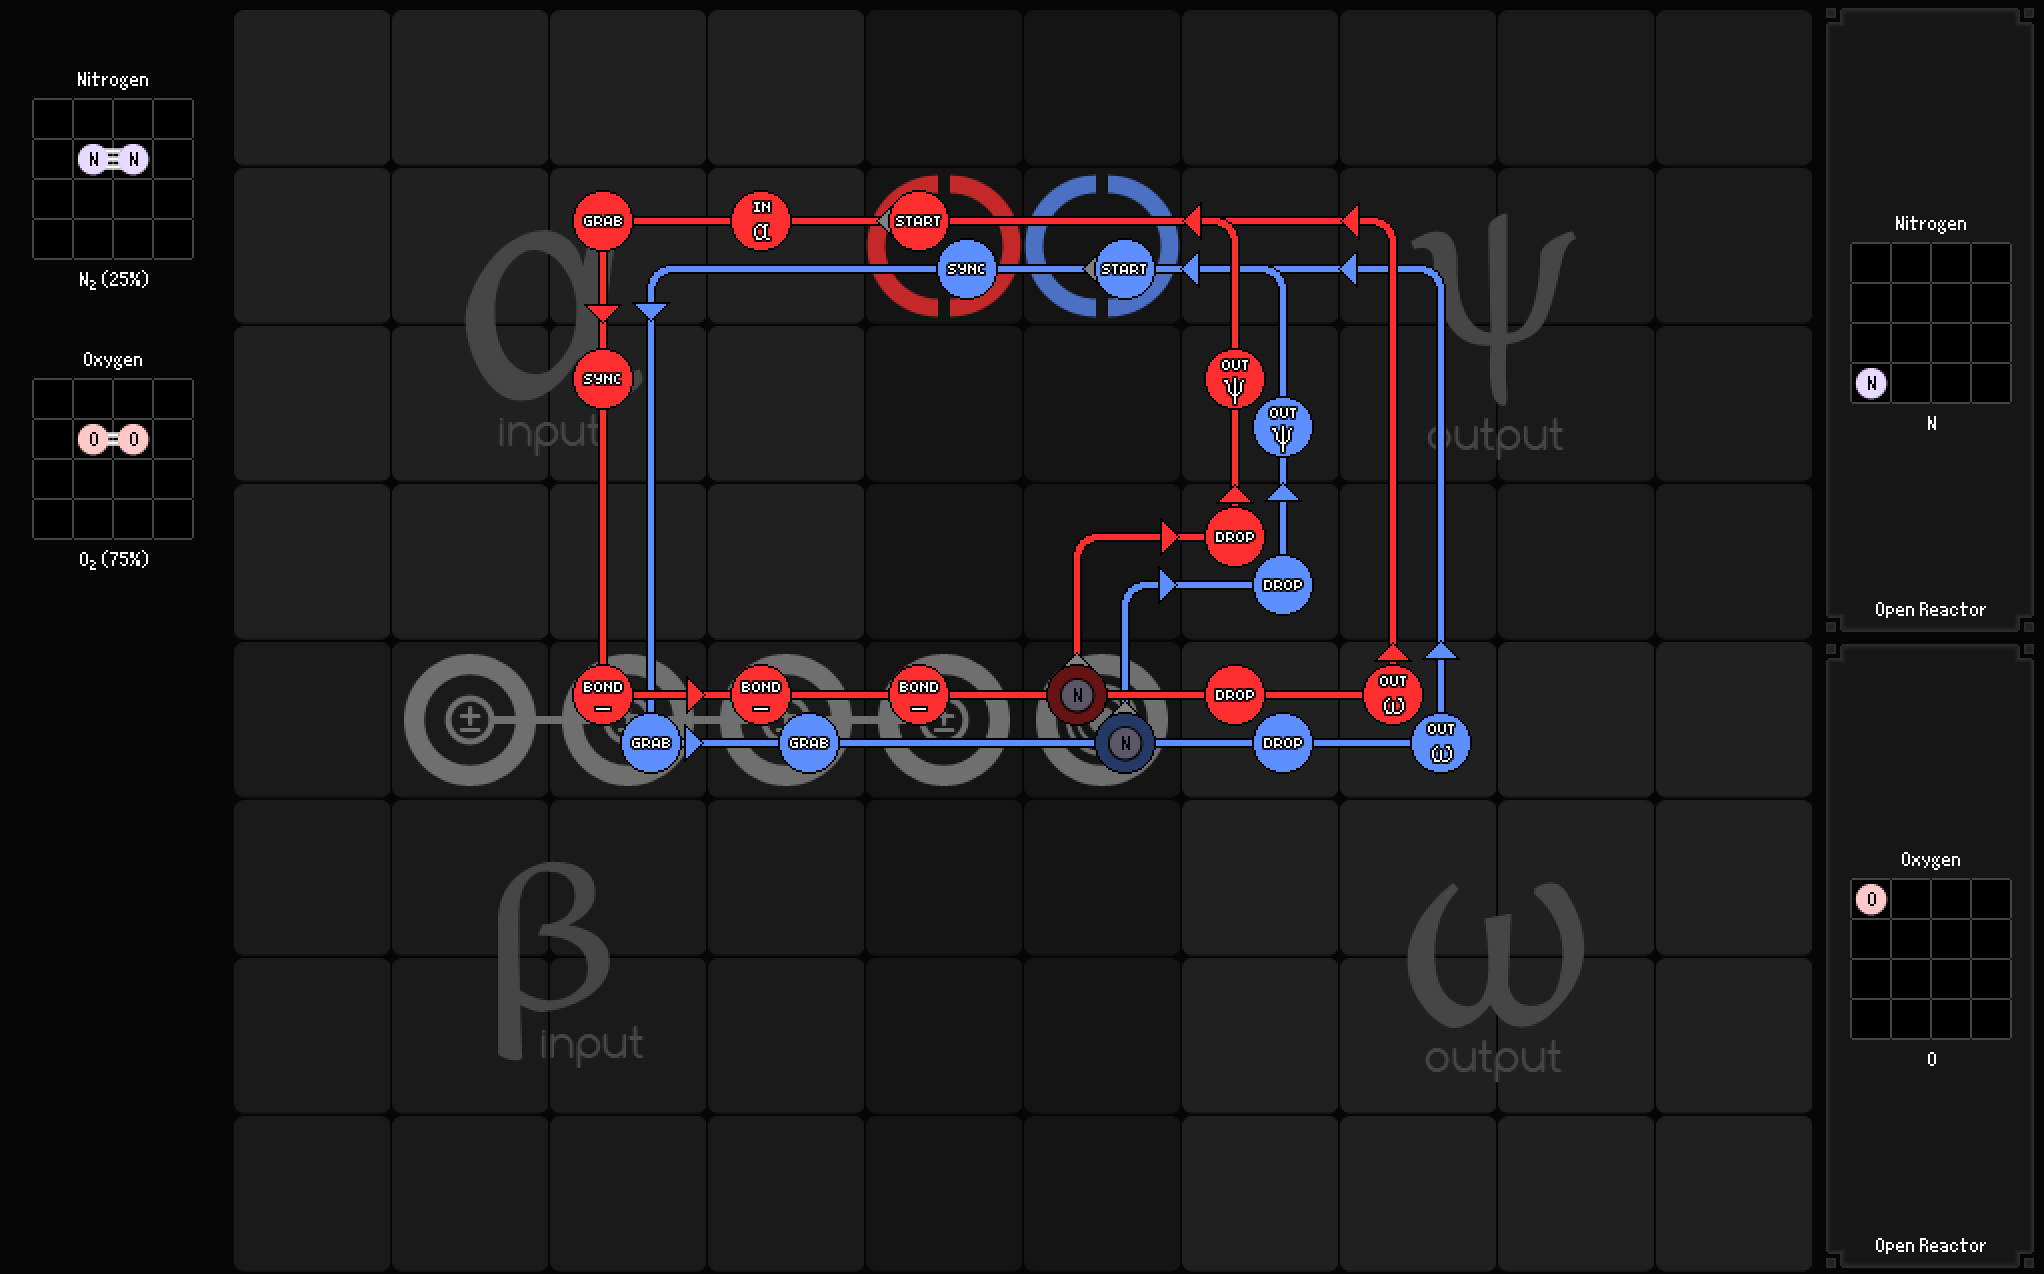 1_Story_Mode/4_Alkonost/SpaceChem-4.5.a/Reactor_1.png